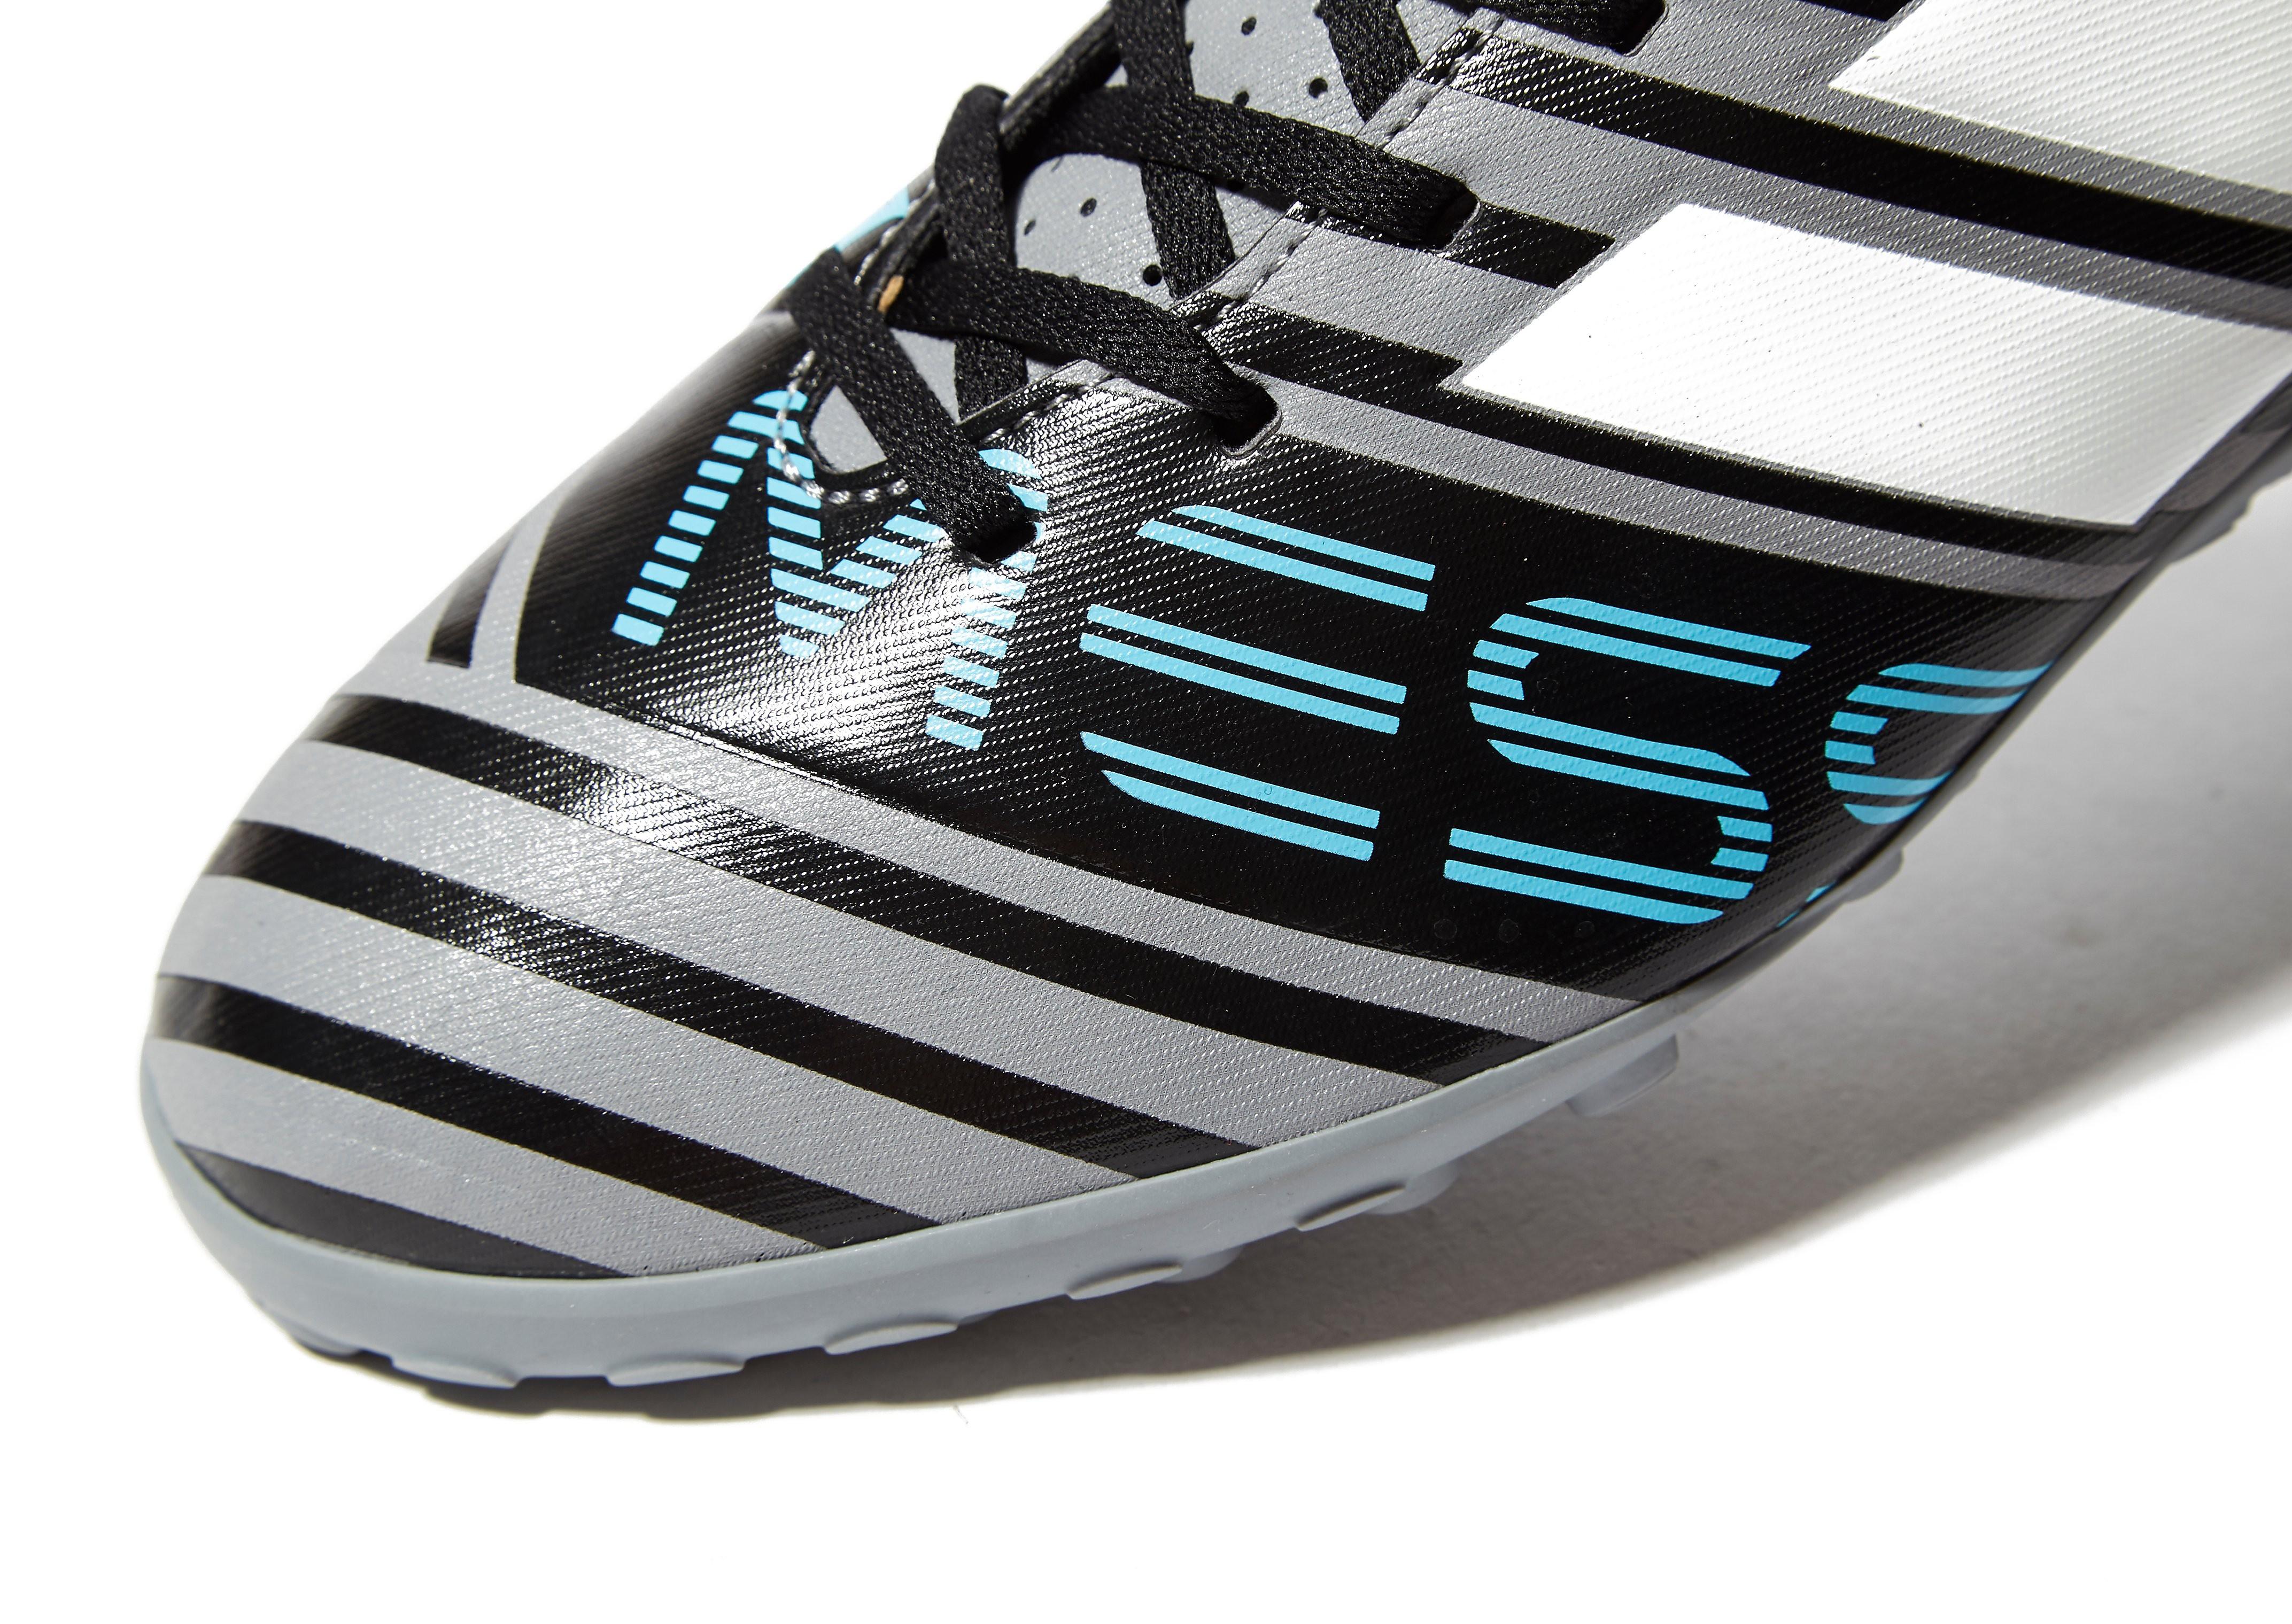 adidas Cold Blooded Nemeziz Messi 17.4 TF